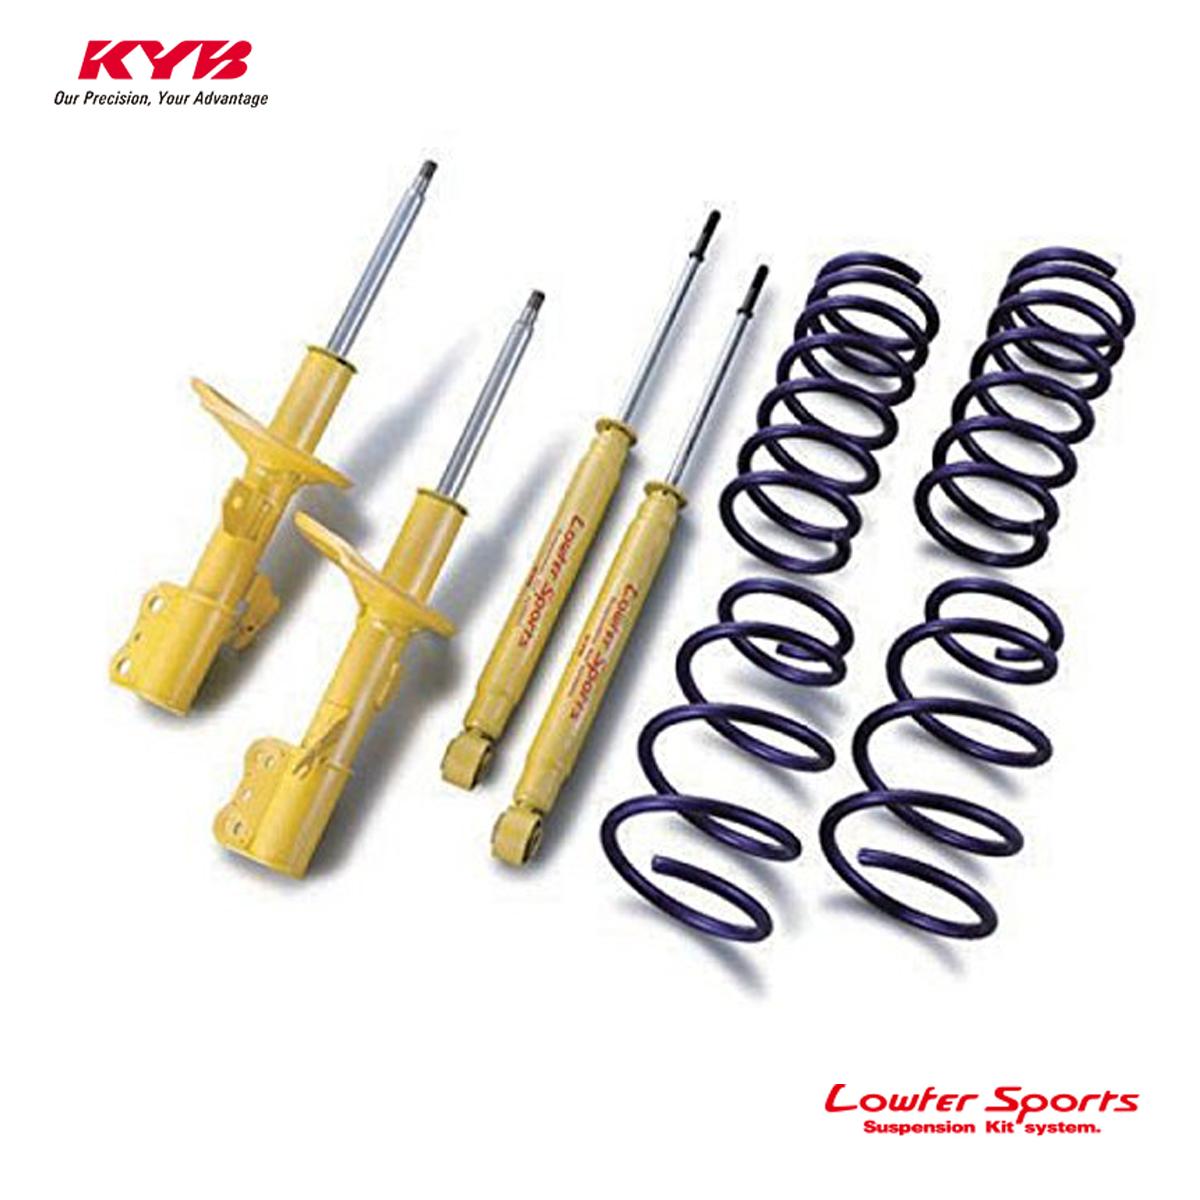 KYB カヤバ スイフト ZC13S ショックアブソーバー サスペンションキット LOWFER SPORTS KIT LKIT-ZC83S 配送先条件有り